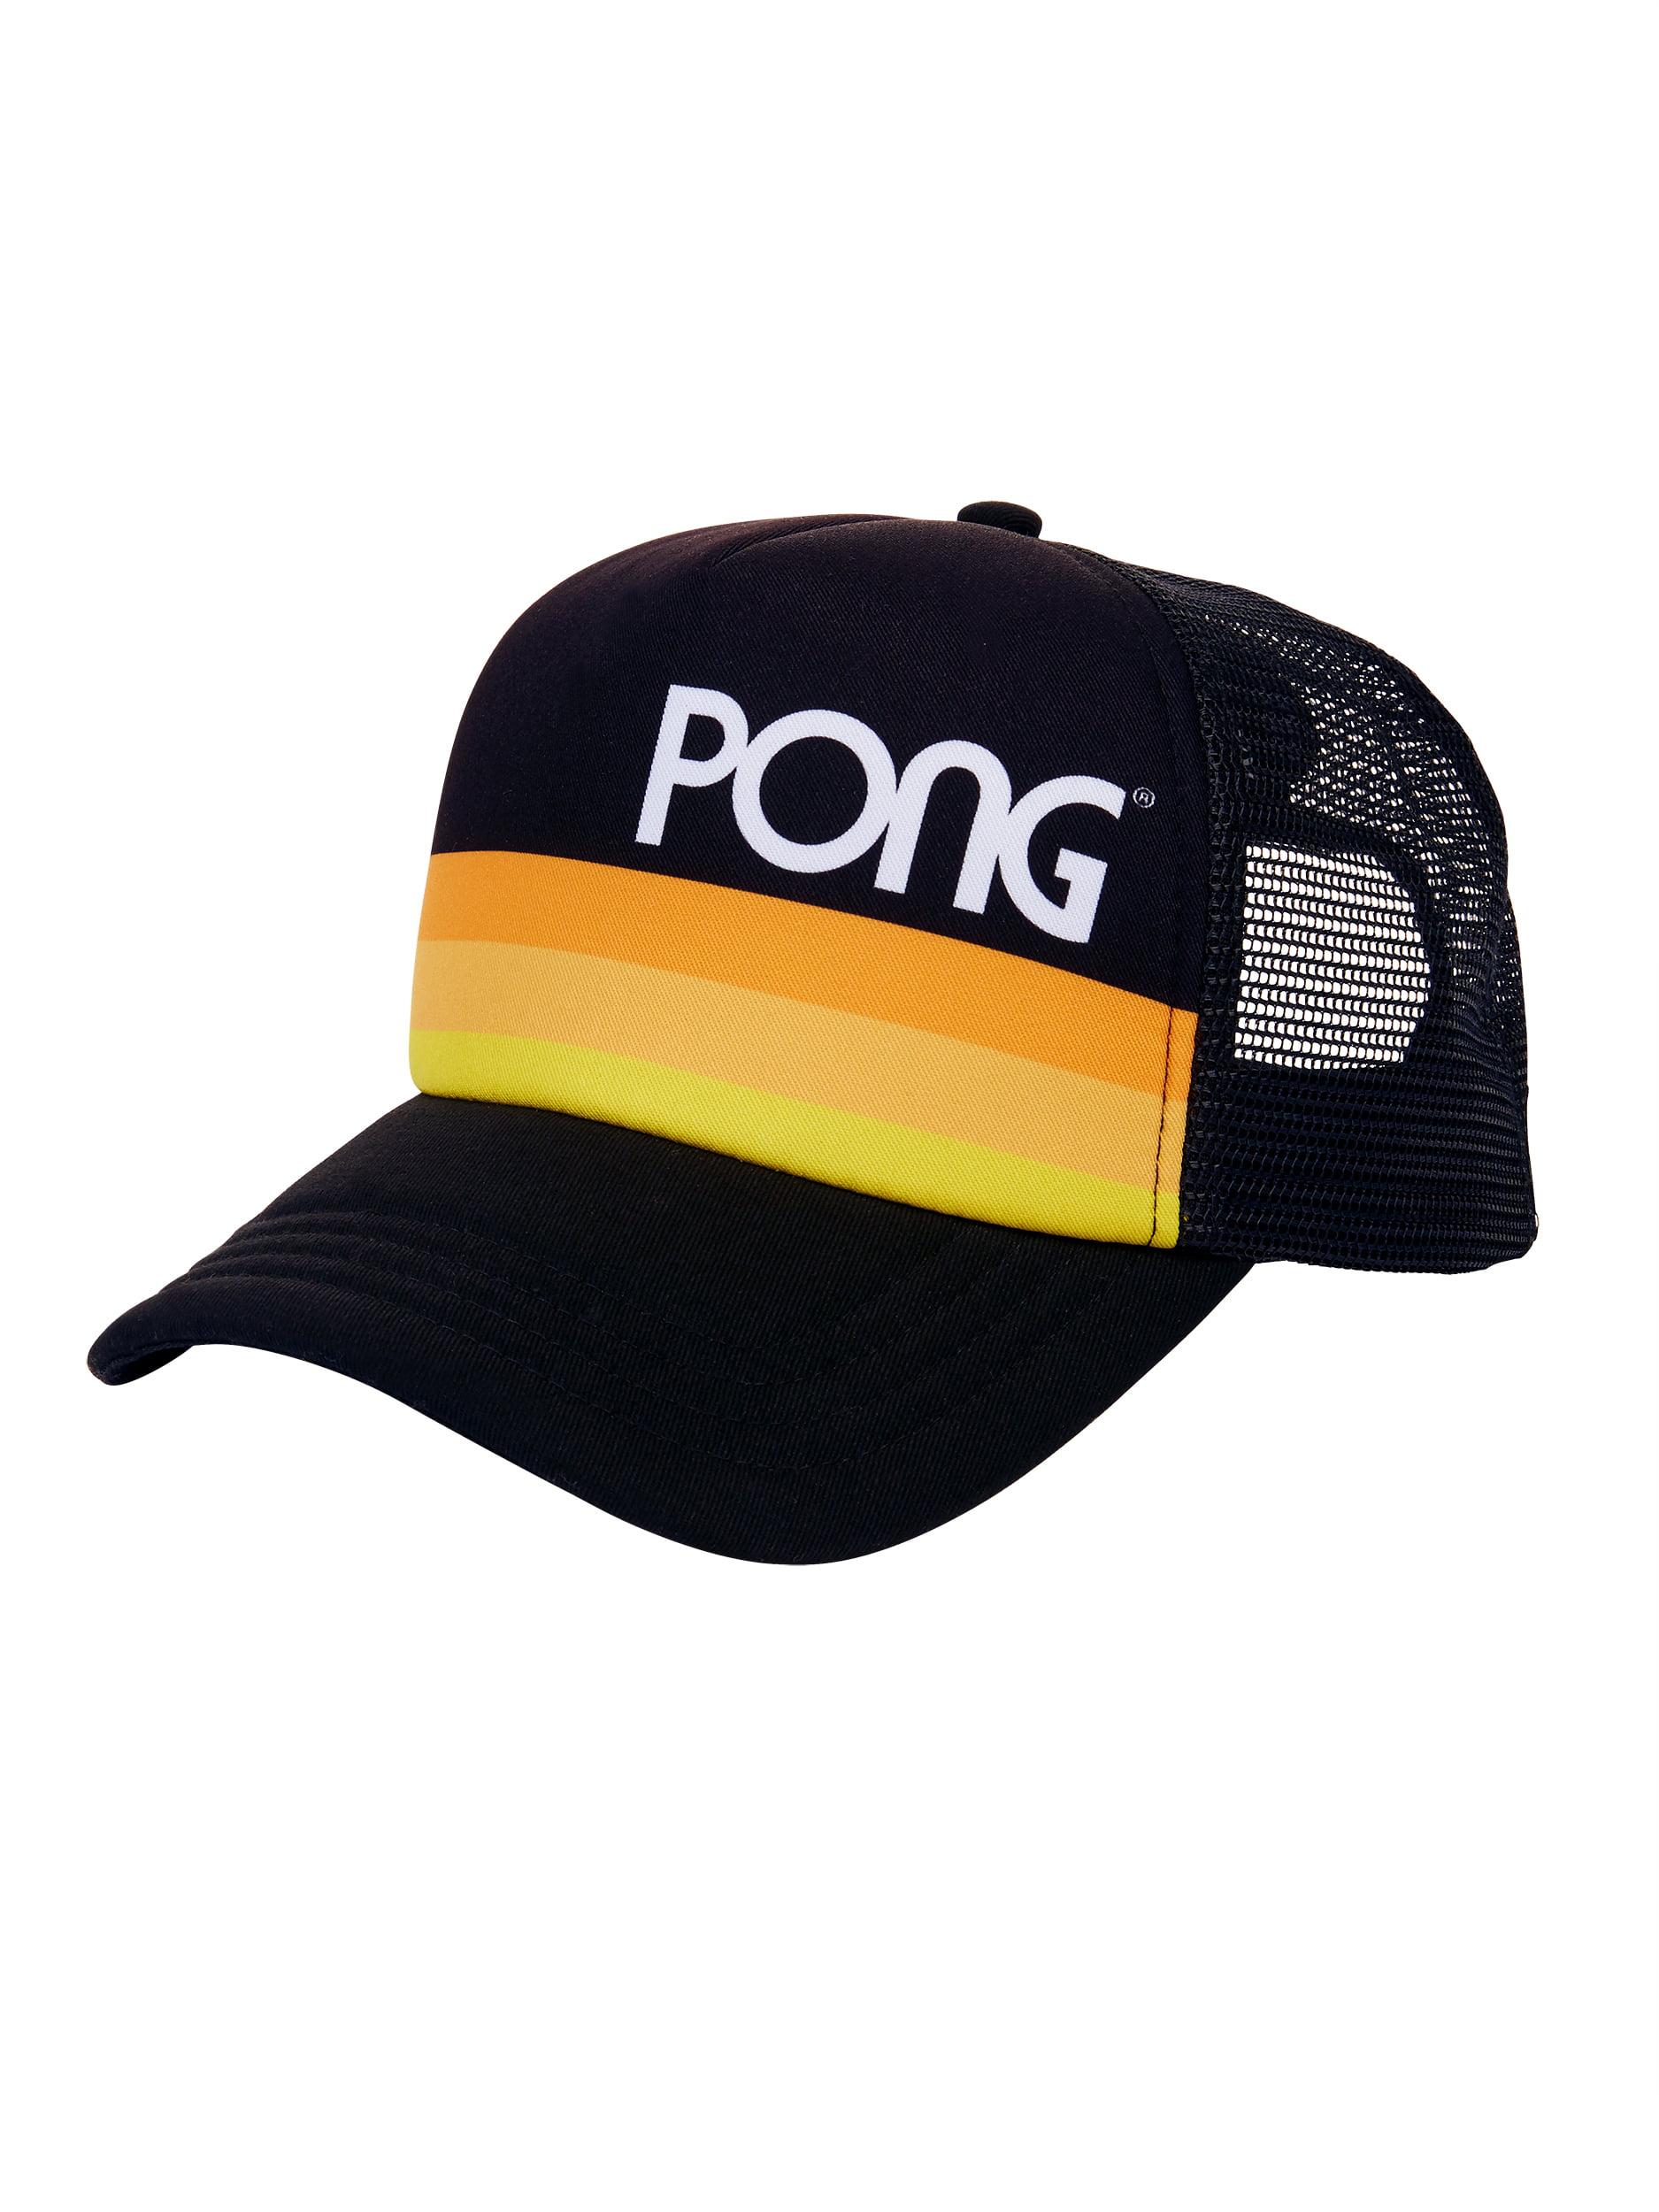 the latest bda16 31704 Atari - Atari Men s Pong Hat - Walmart.com